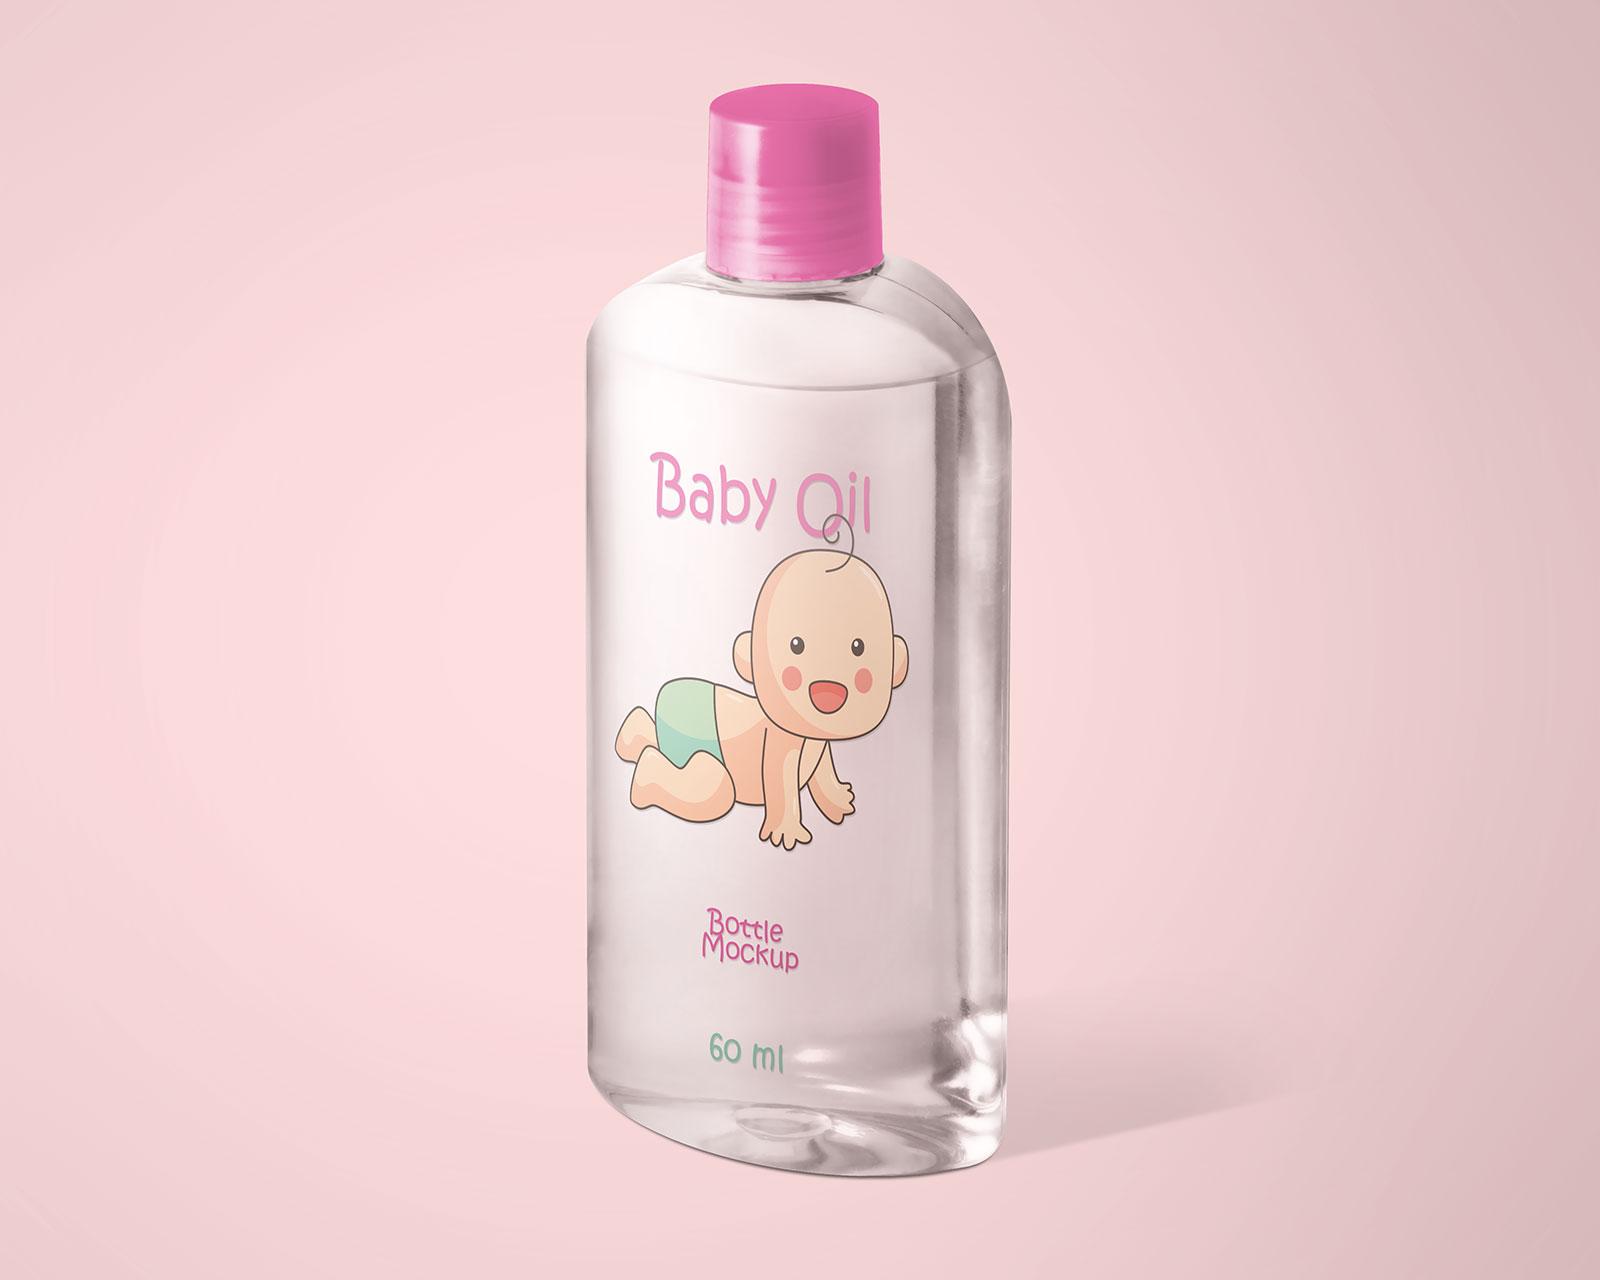 Free Cosmetics-Baby-Oil-Bottle Mockup PSD Set